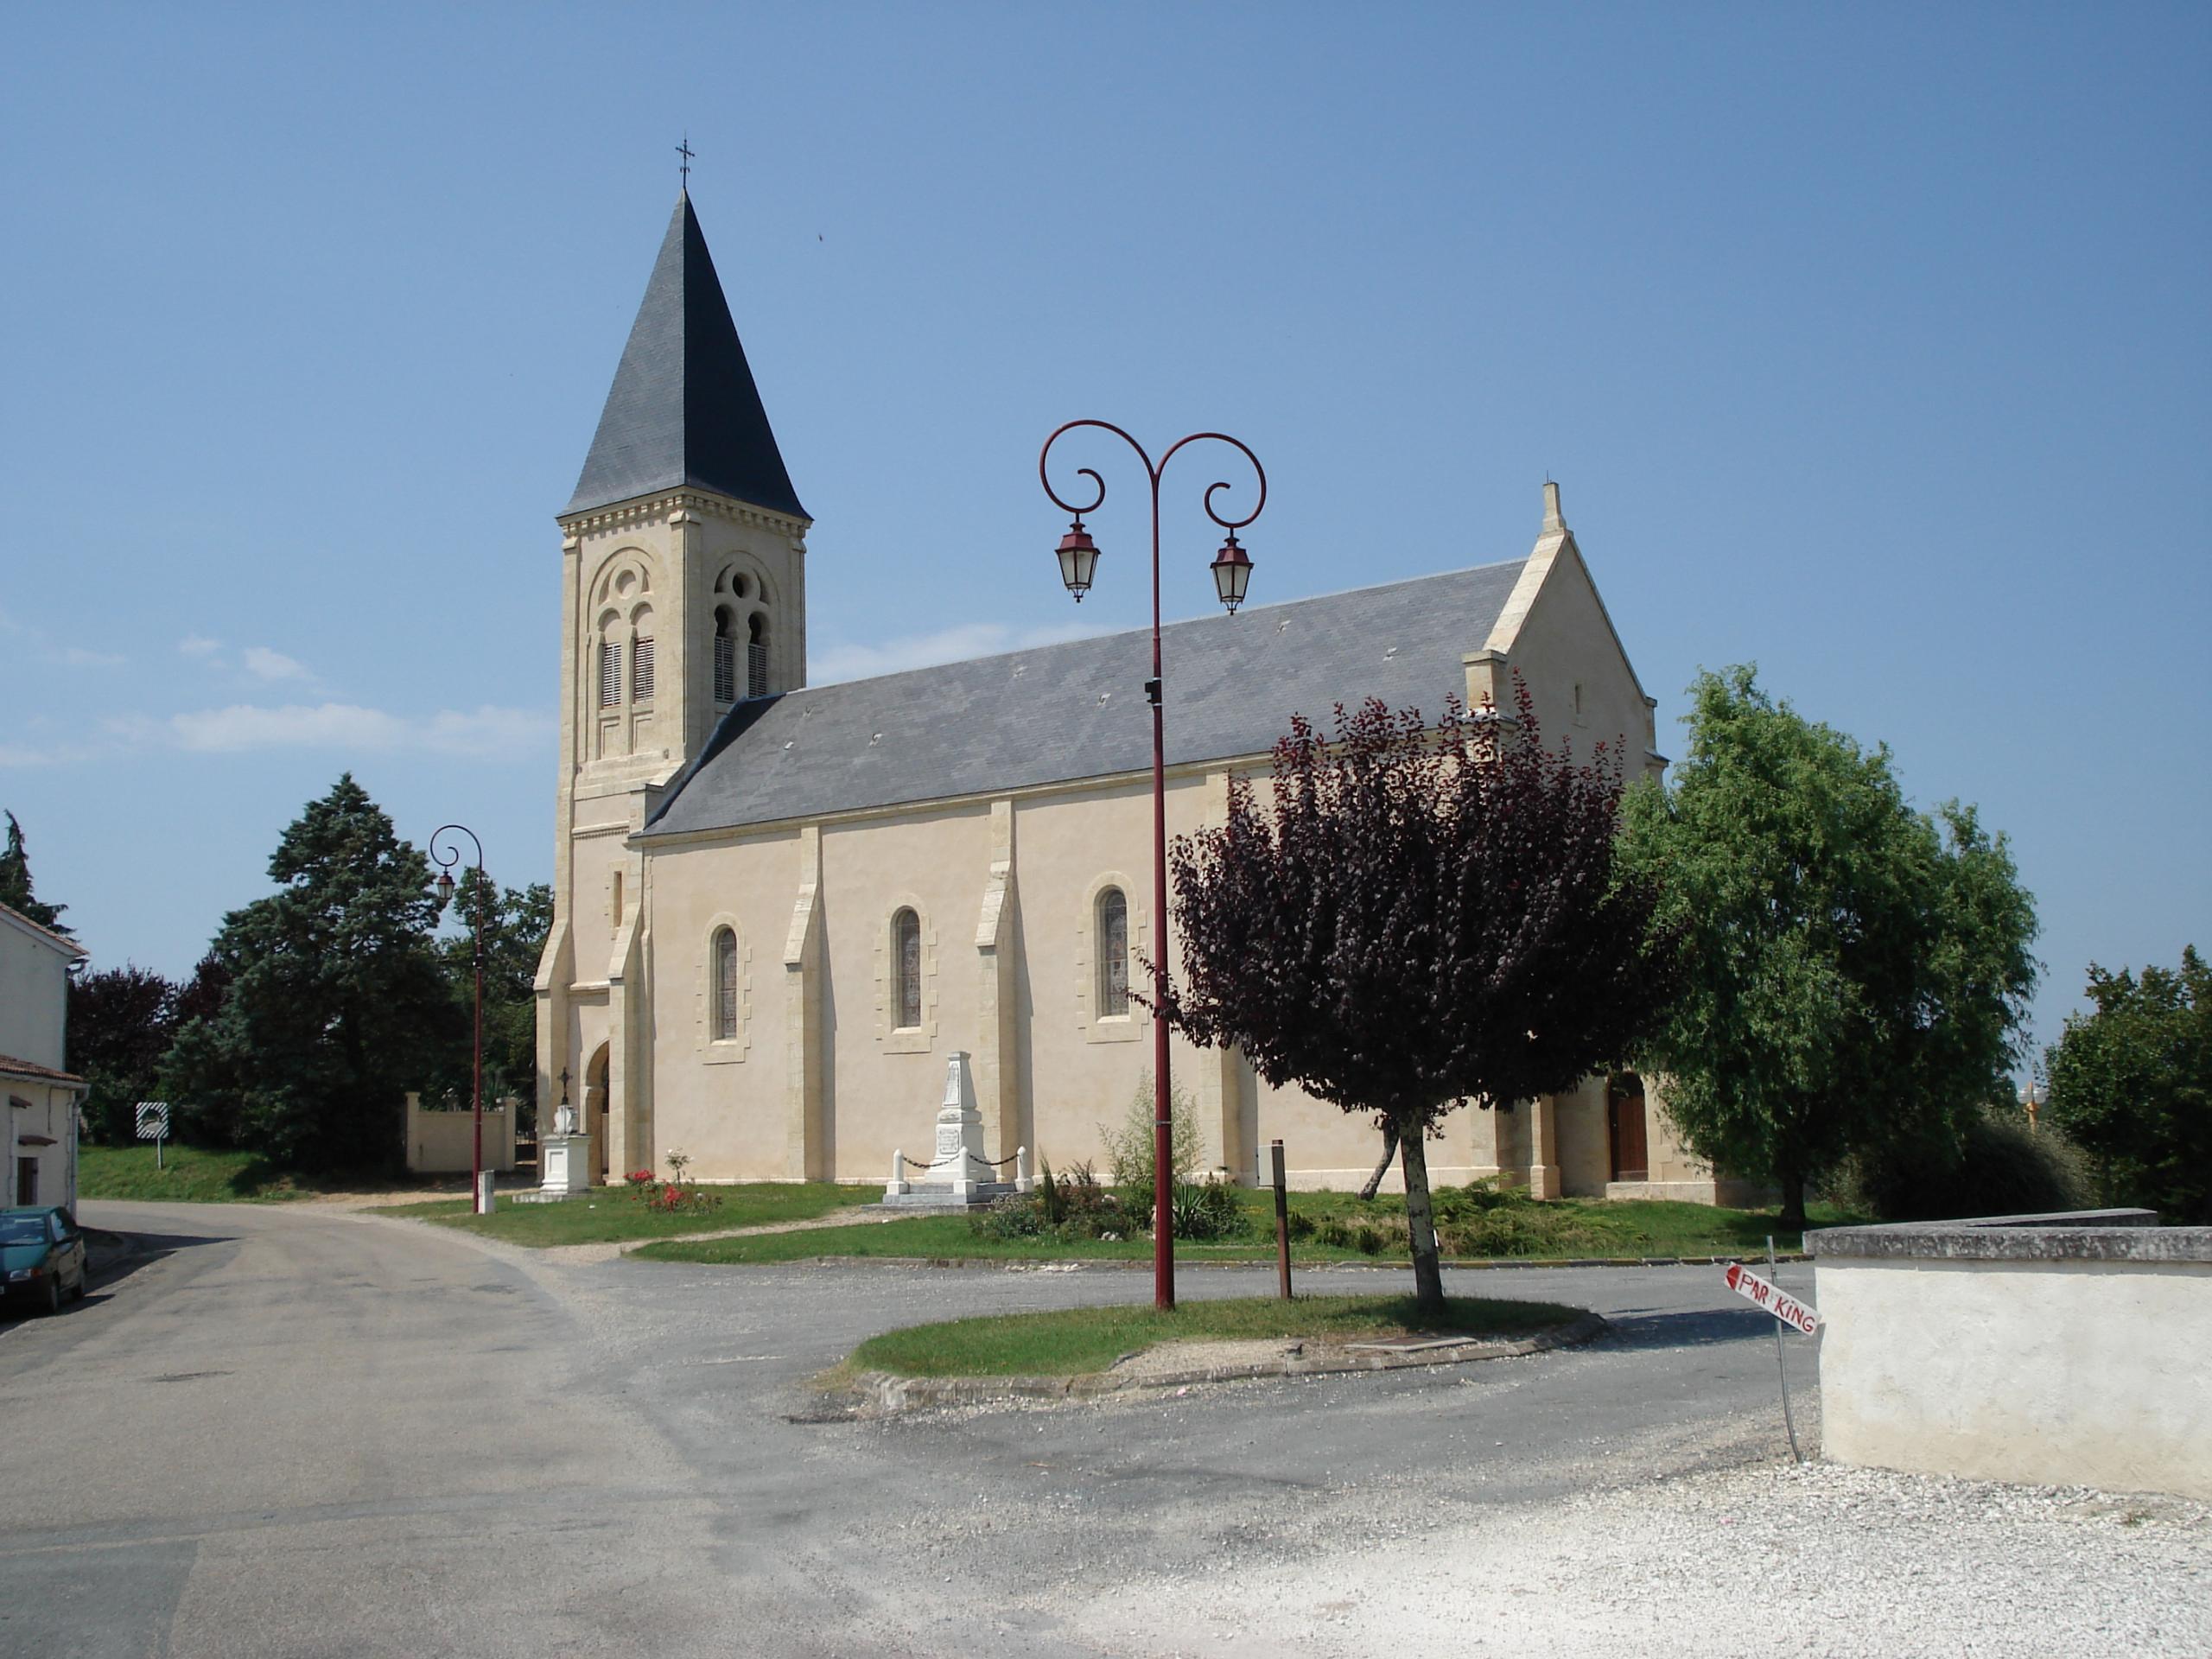 Saint-Géraud-de-Corps